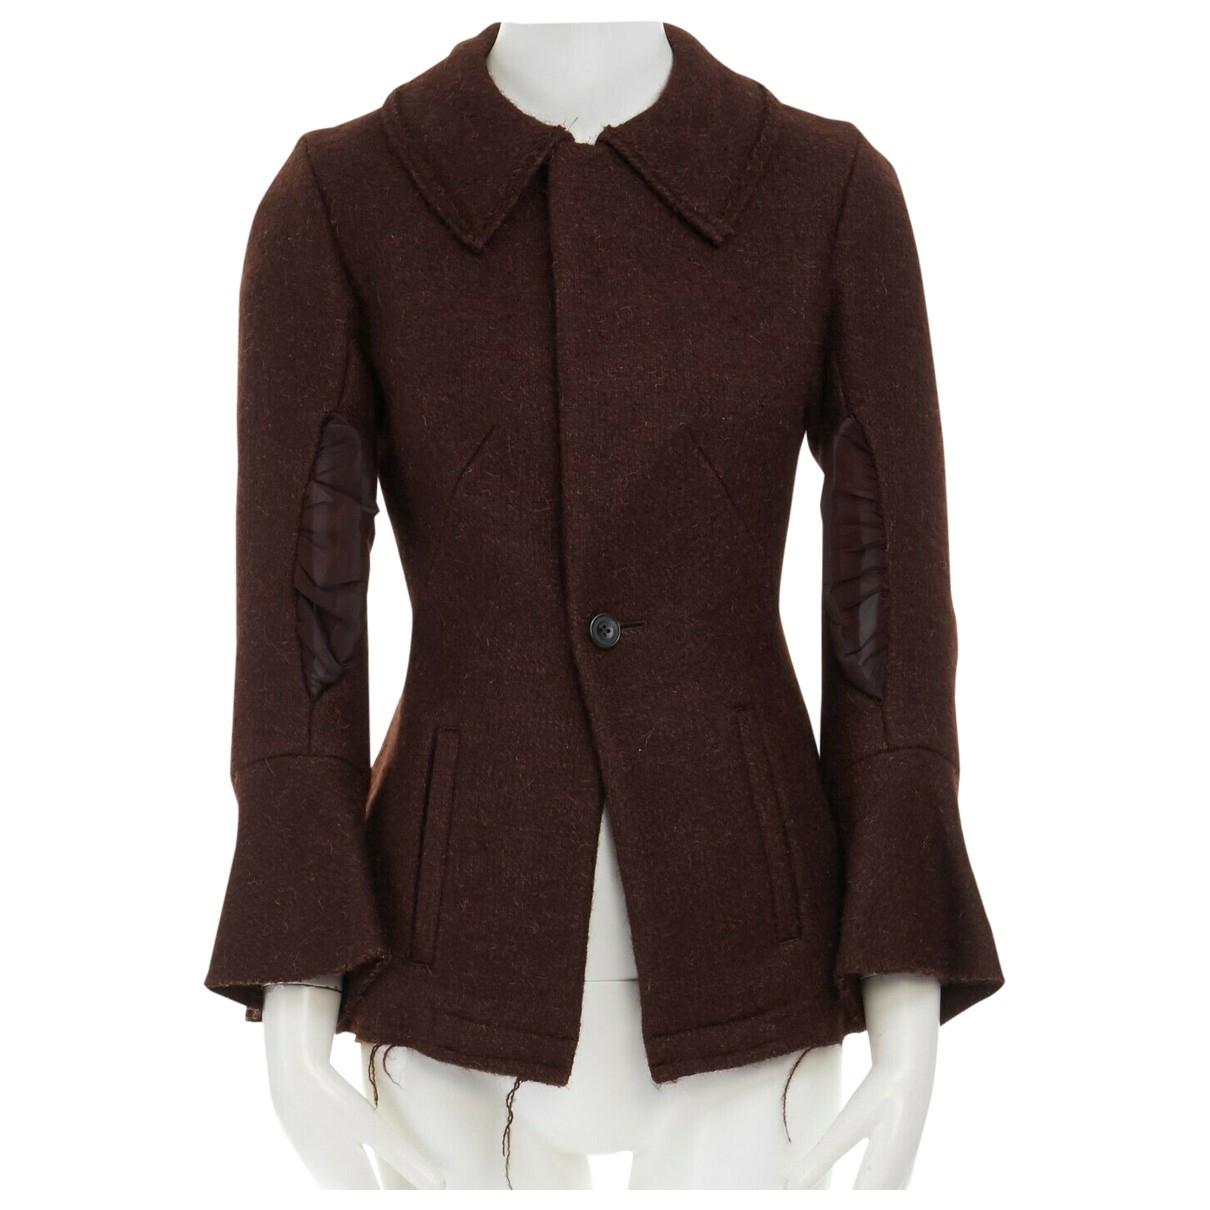 Yohji Yamamoto - Veste   pour femme en laine - marron